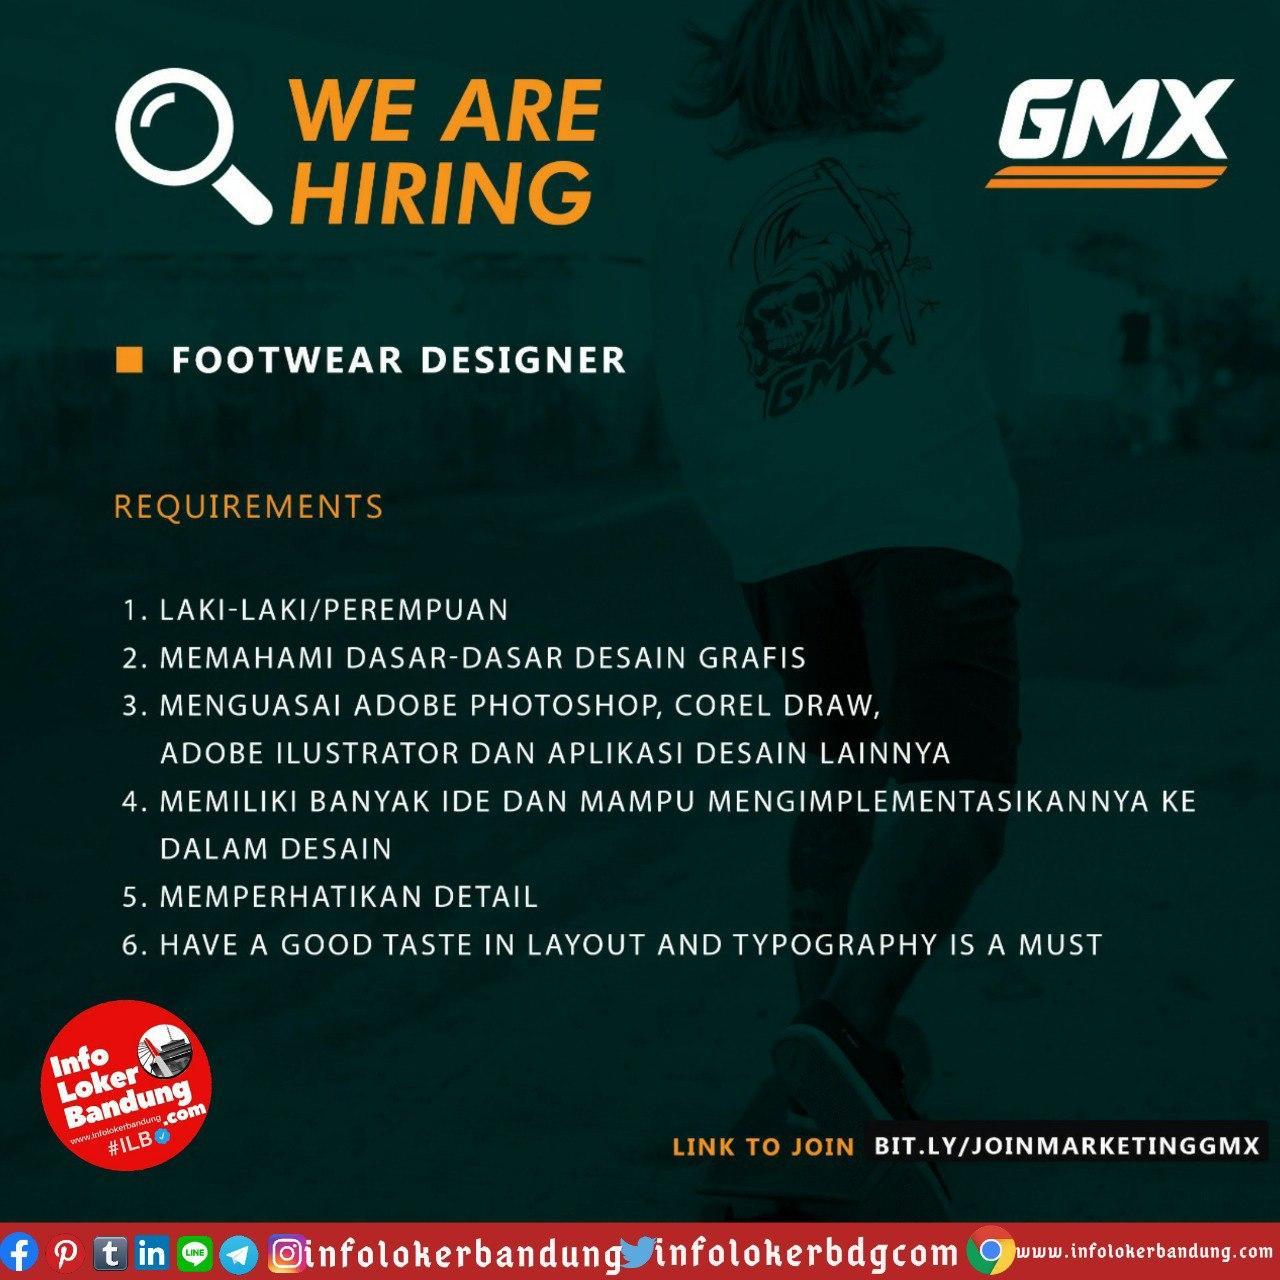 Lowongan Kerja Footwear Designer GMX Bandung Juli 2020